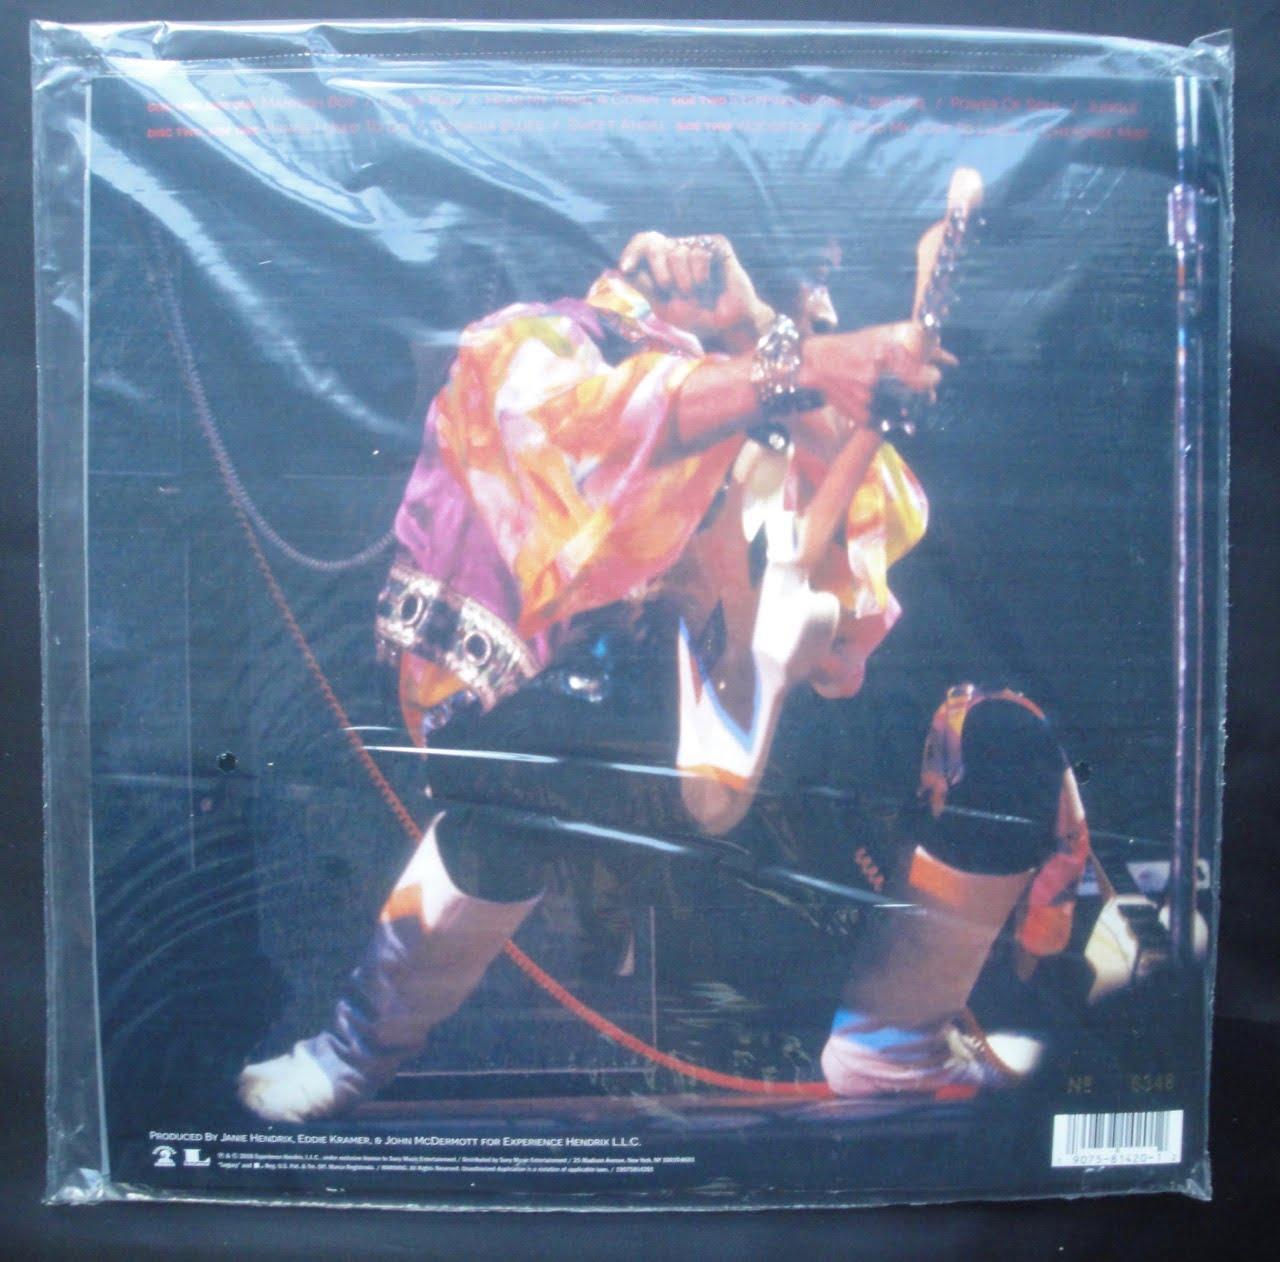 Jimi Hendrix - Both Sides of the Sky - 2XLP, 180 Gram Vinyl, Gatefold Jacket, 2018